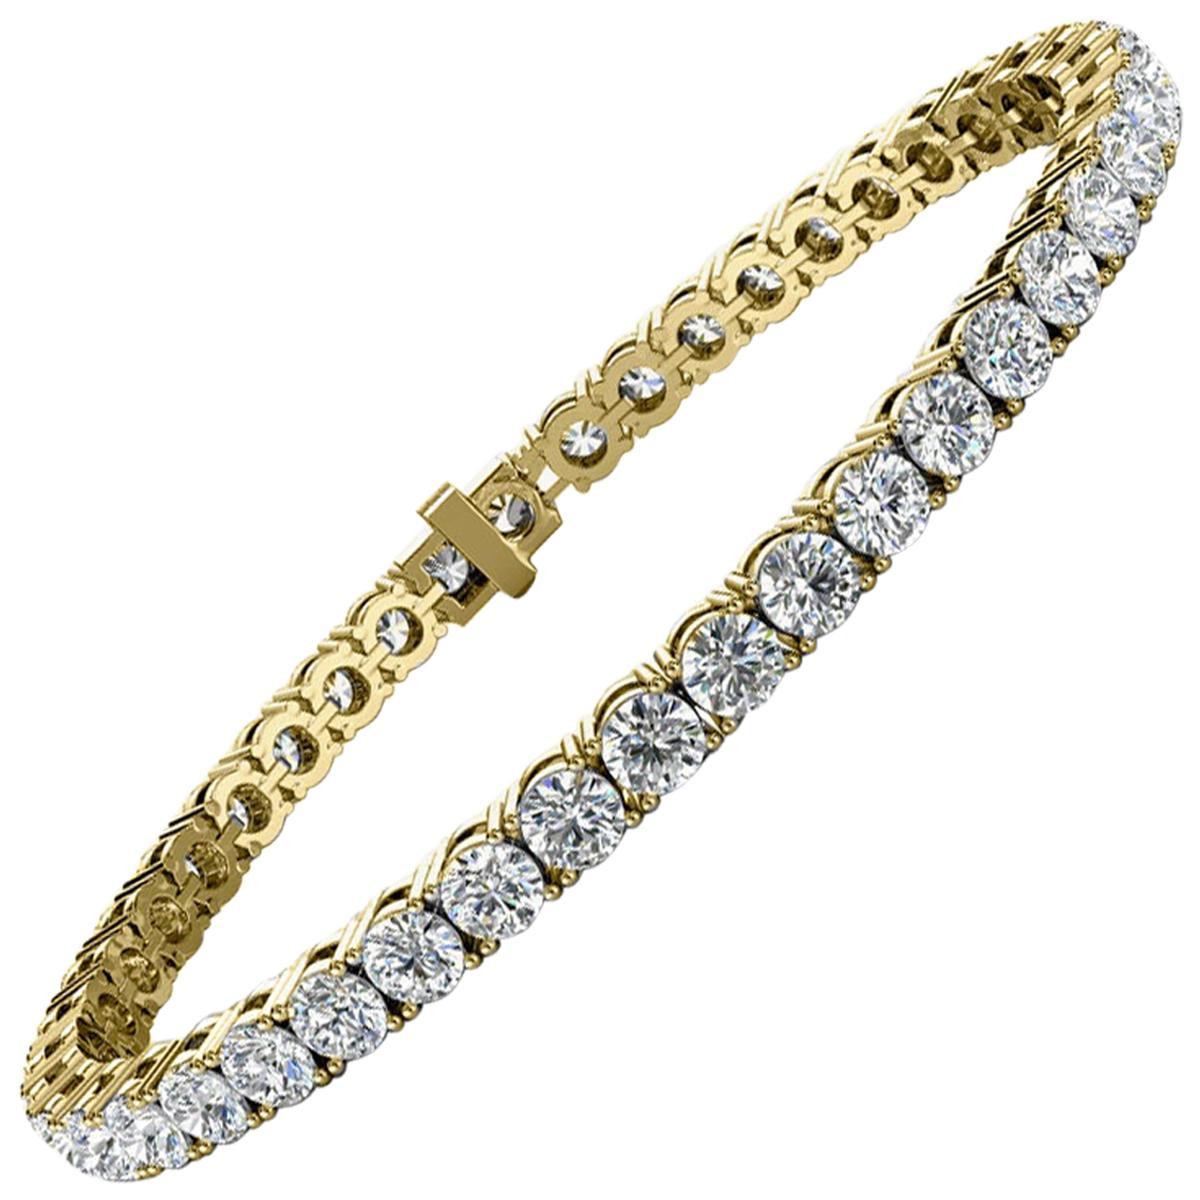 14k Yellow Gold Four Prongs Diamond Tennis Bracelet '8 Ct .tw'